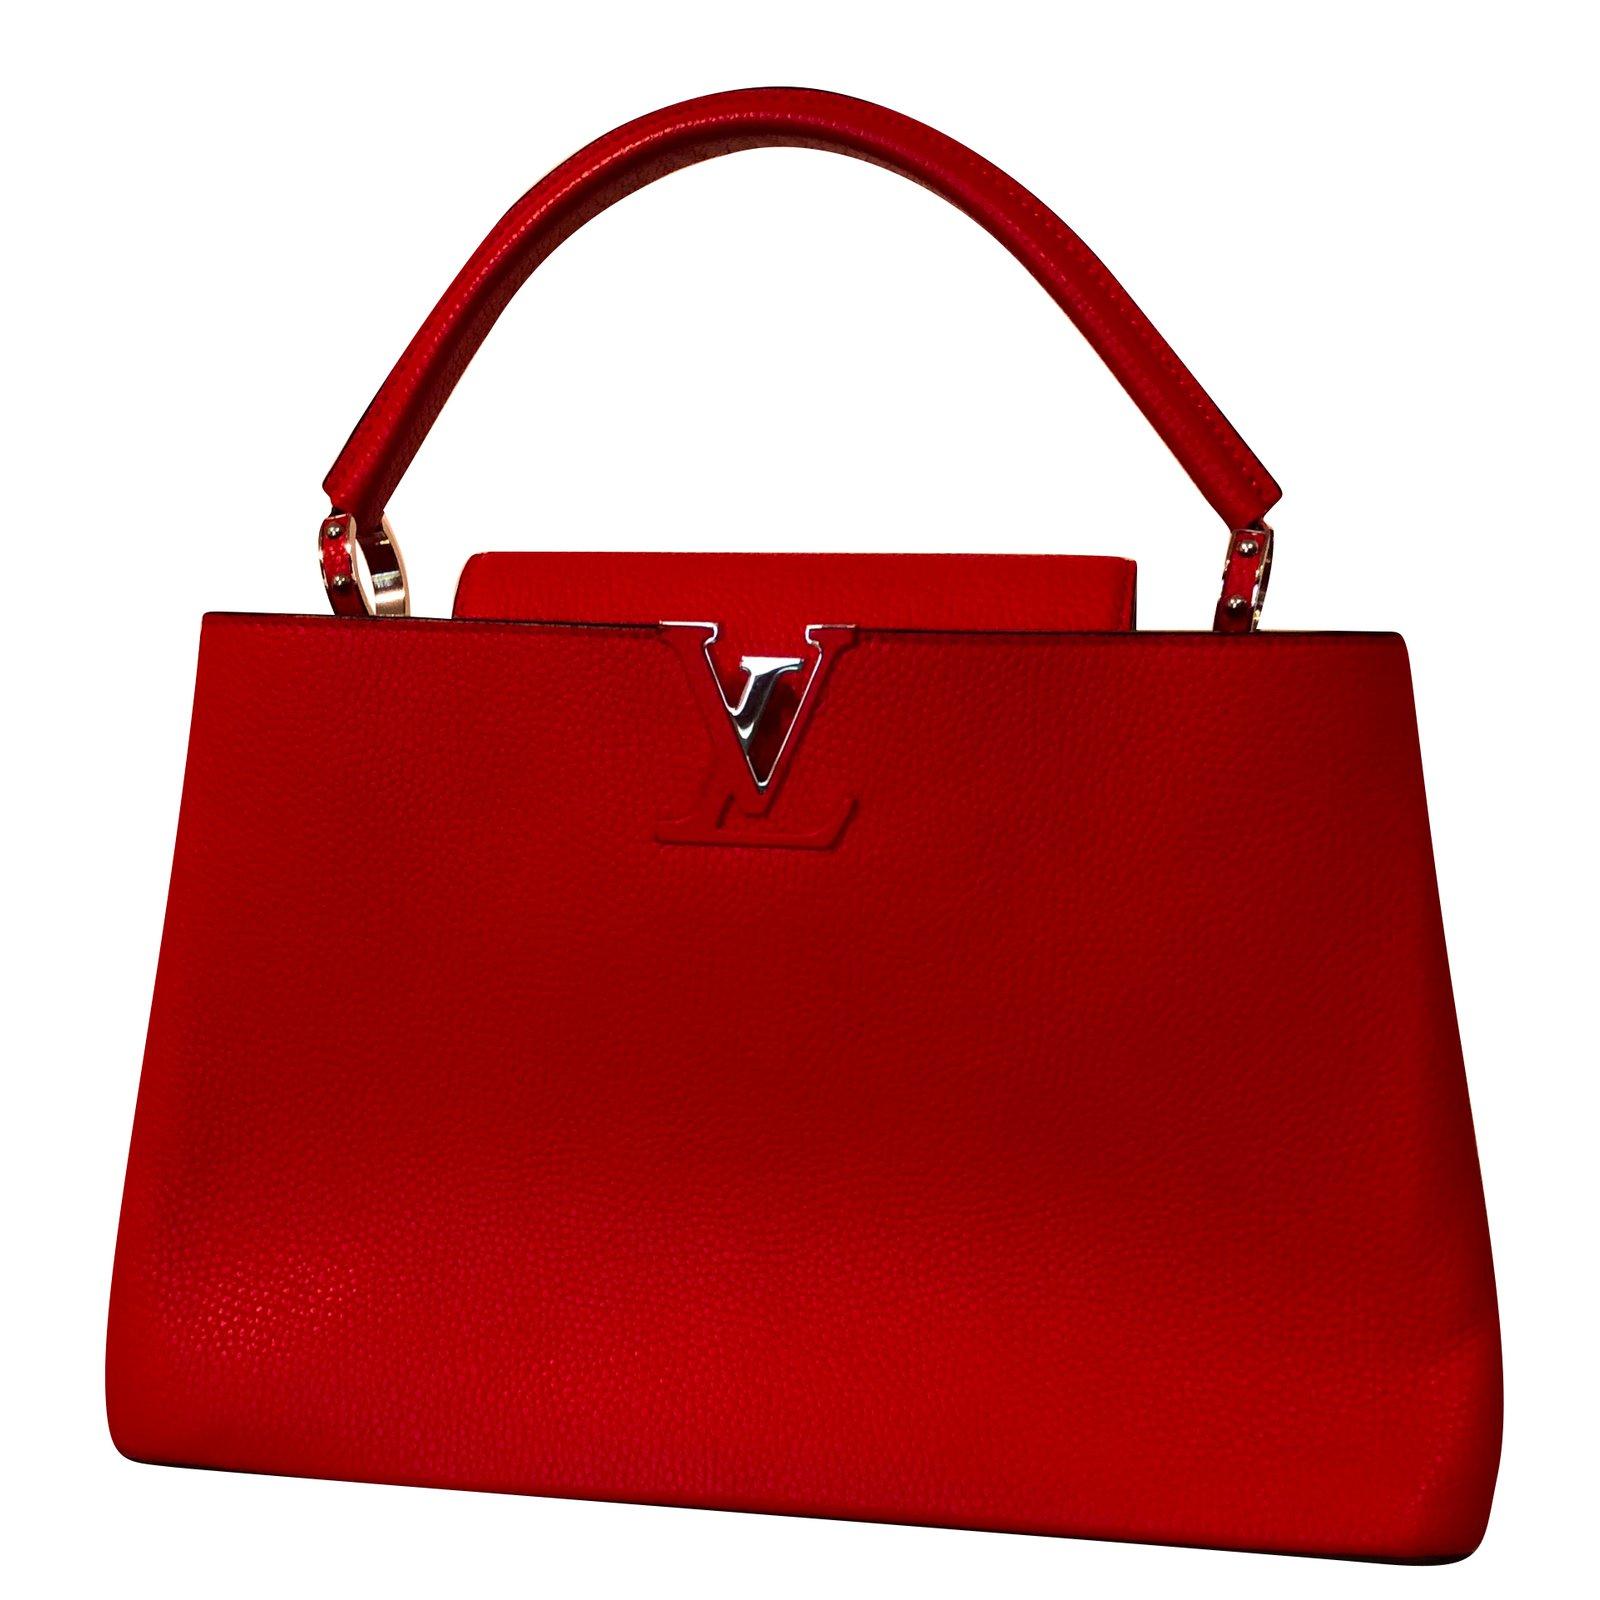 Louis Vuitton Handbags Leather